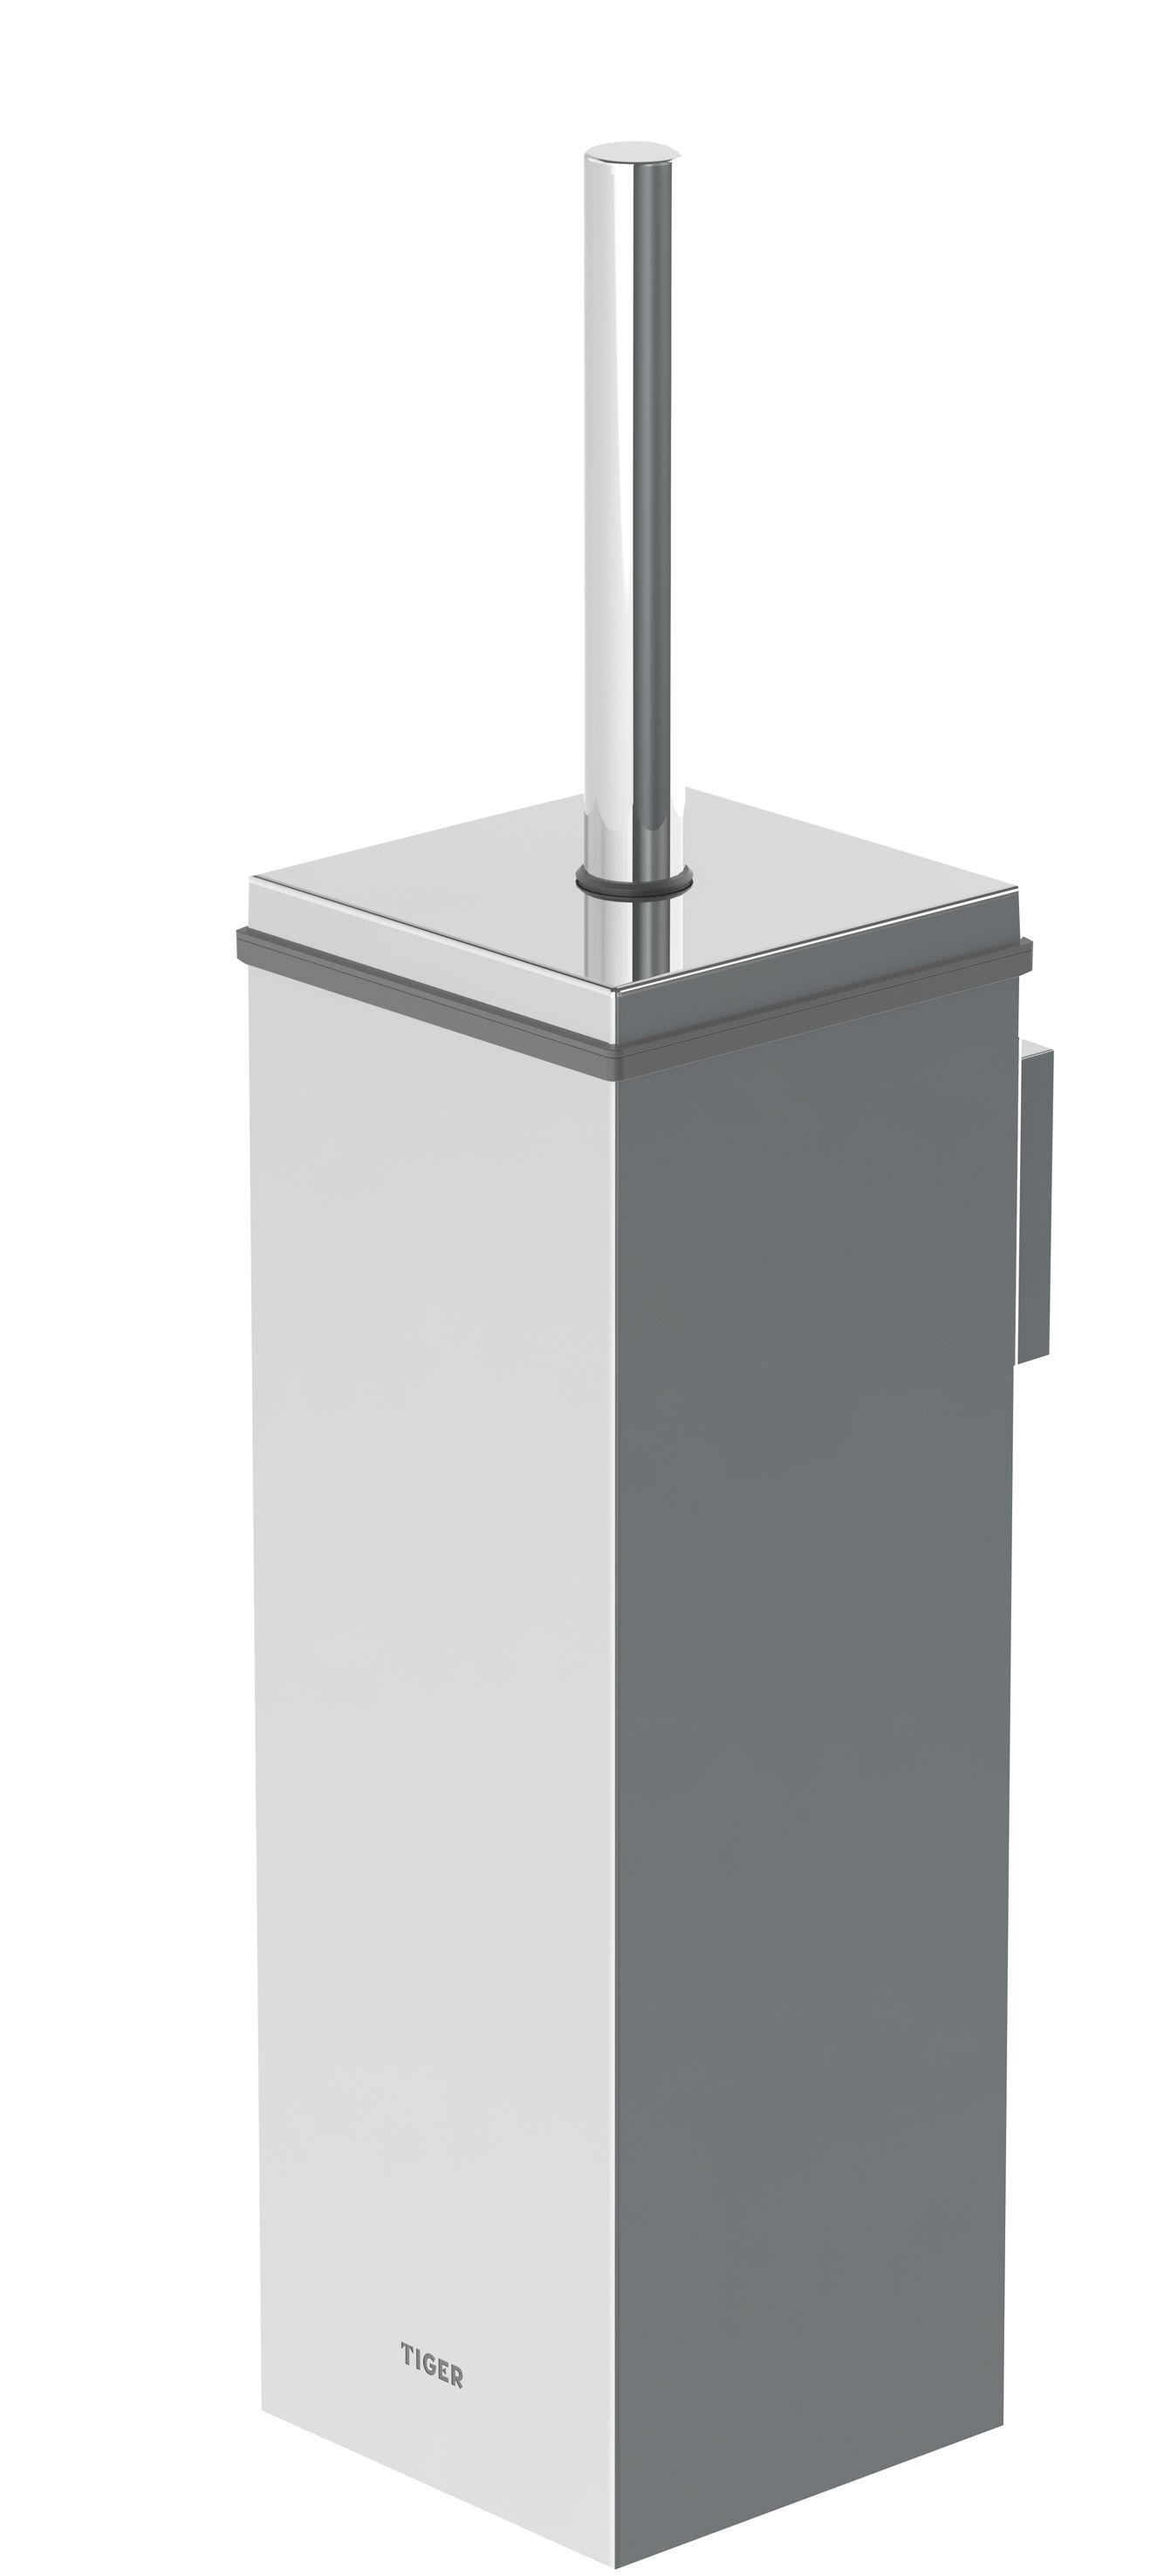 Tiger Items toiletborstelgarnituur rechthoekig RVS